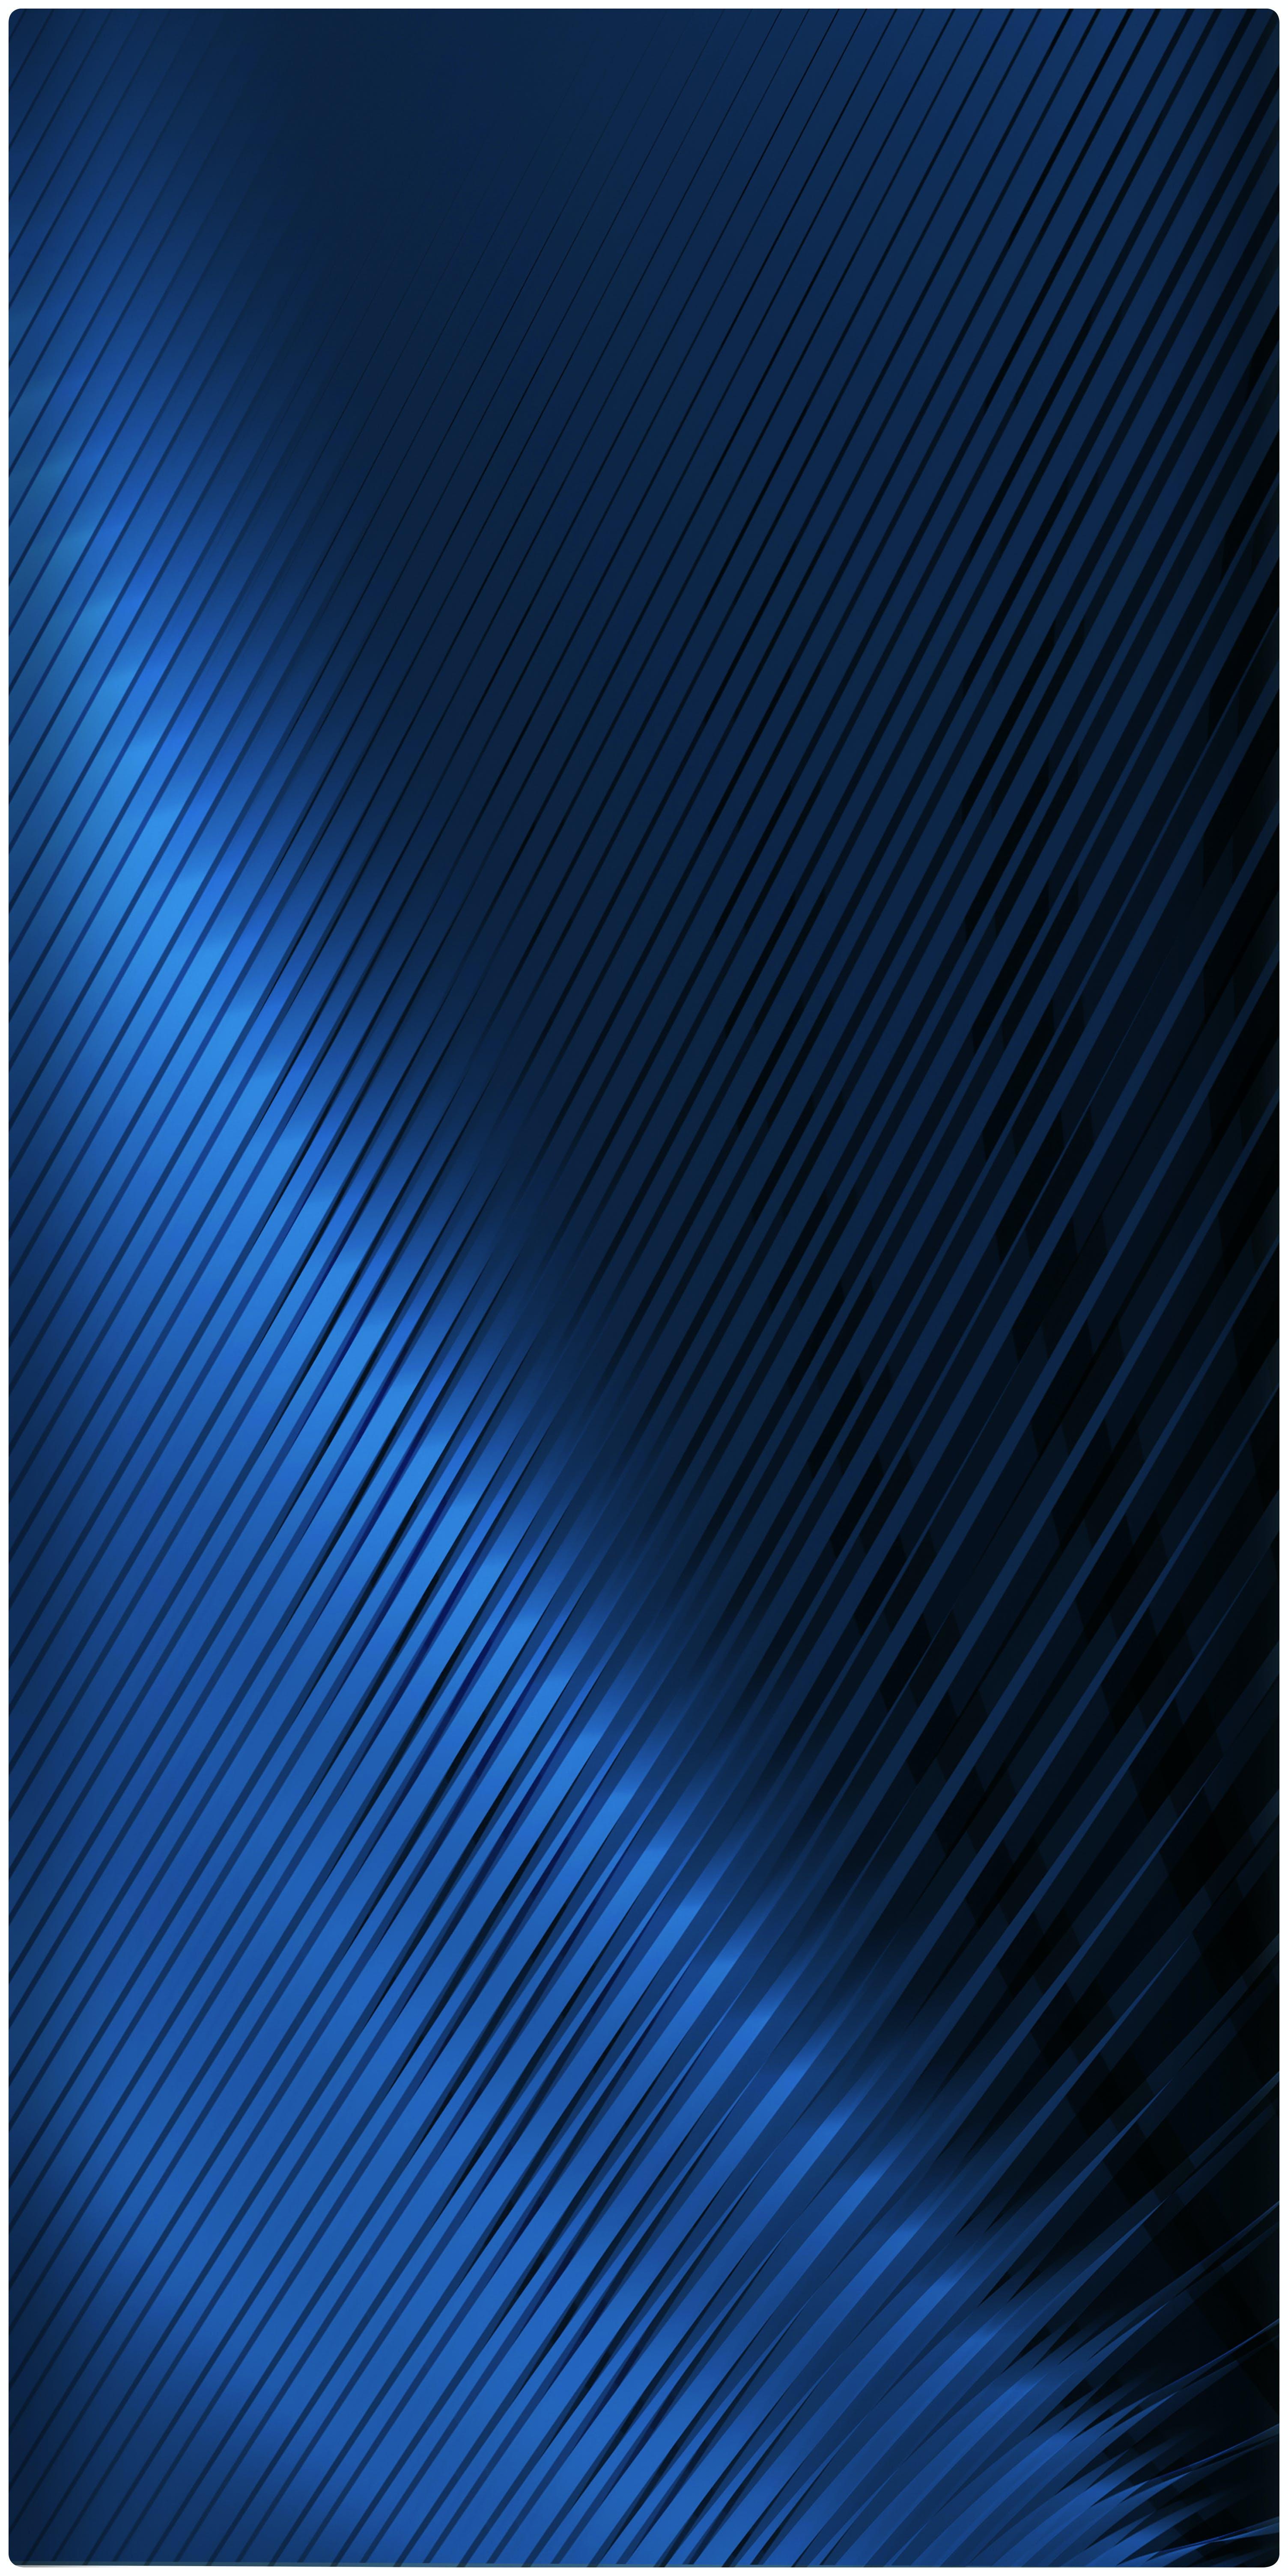 Free stock photo of blue, mobile, stripes, wallpaper